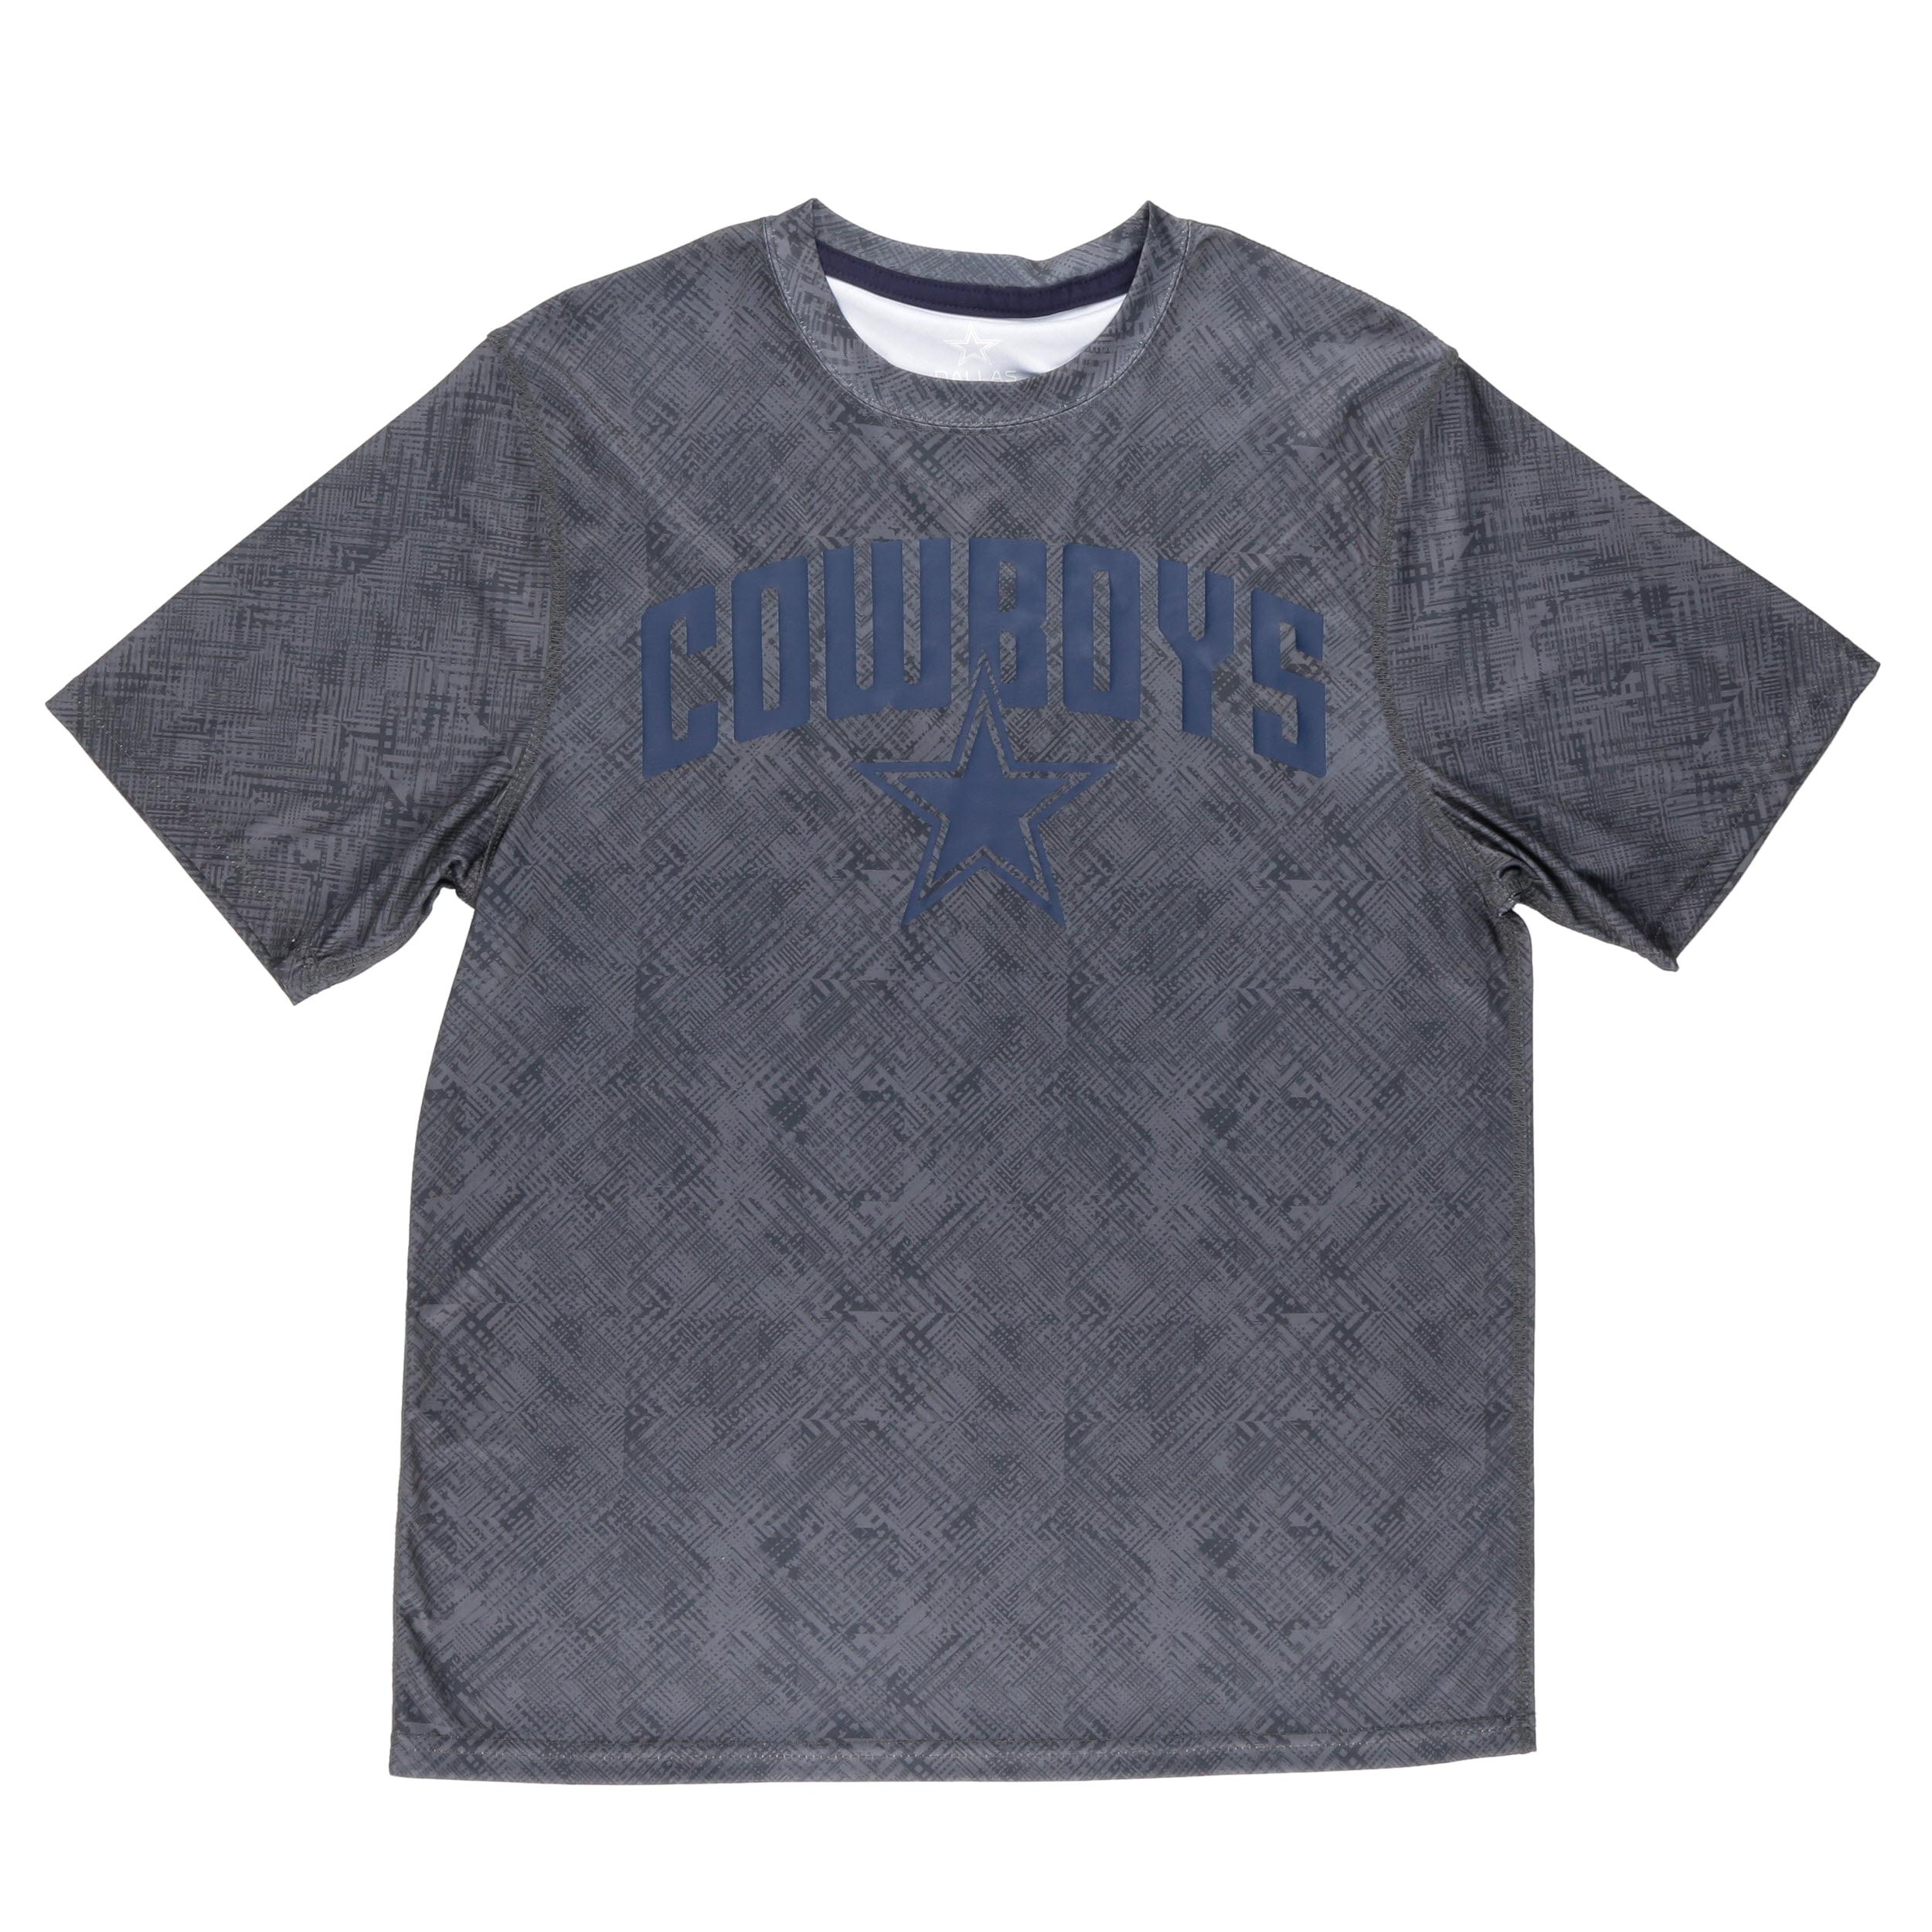 NFL Dallas Cowboys Men's Everette Short Sleeve Performance Tee Shirt